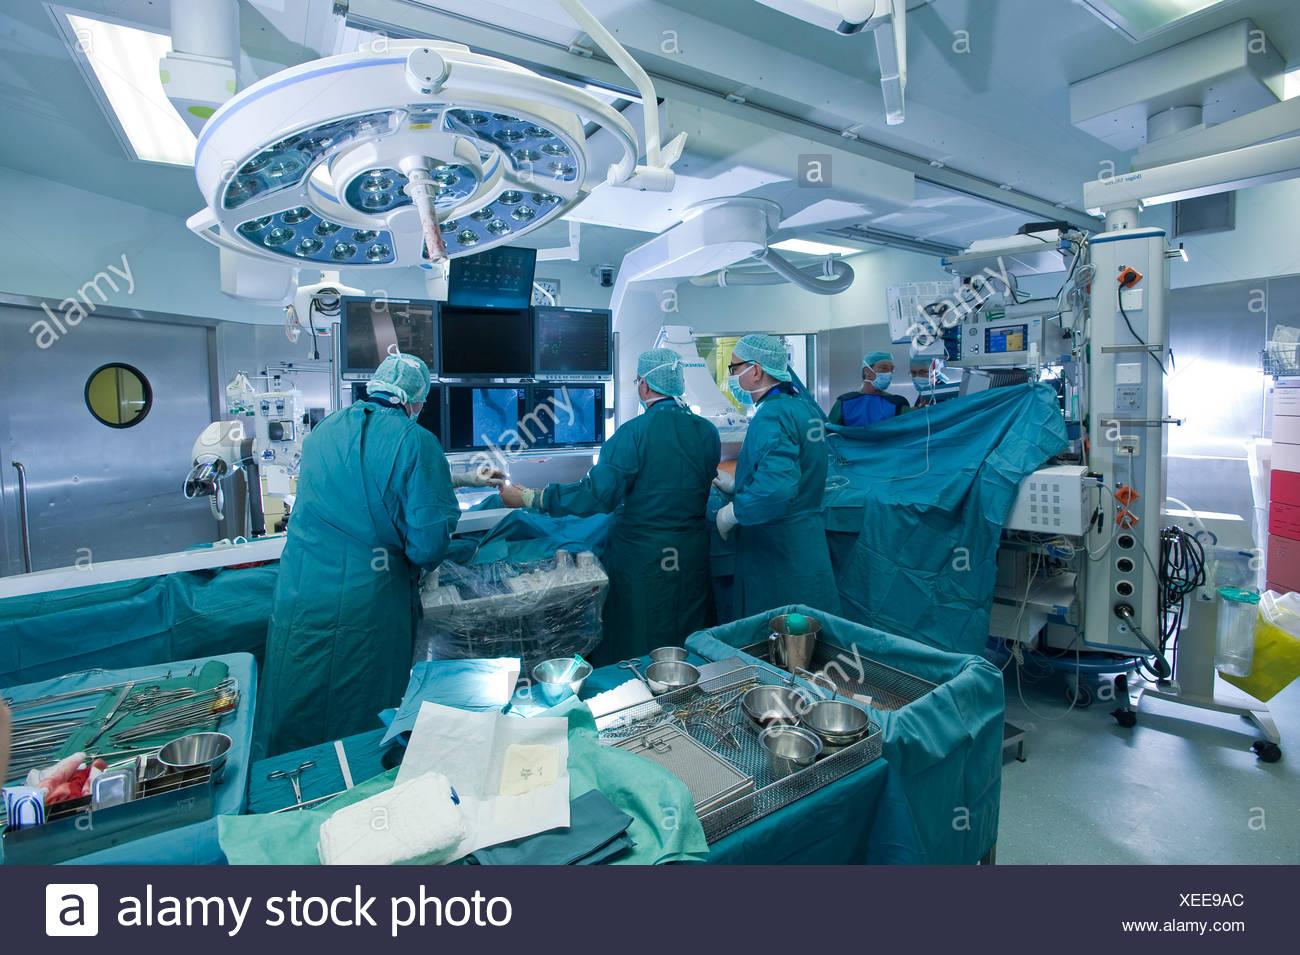 Cardiac surgery in a hybrid operating room, Deutsches Herzzentrum Berlin or German cardiac center, Berlin, Germany, Europe - Stock Image